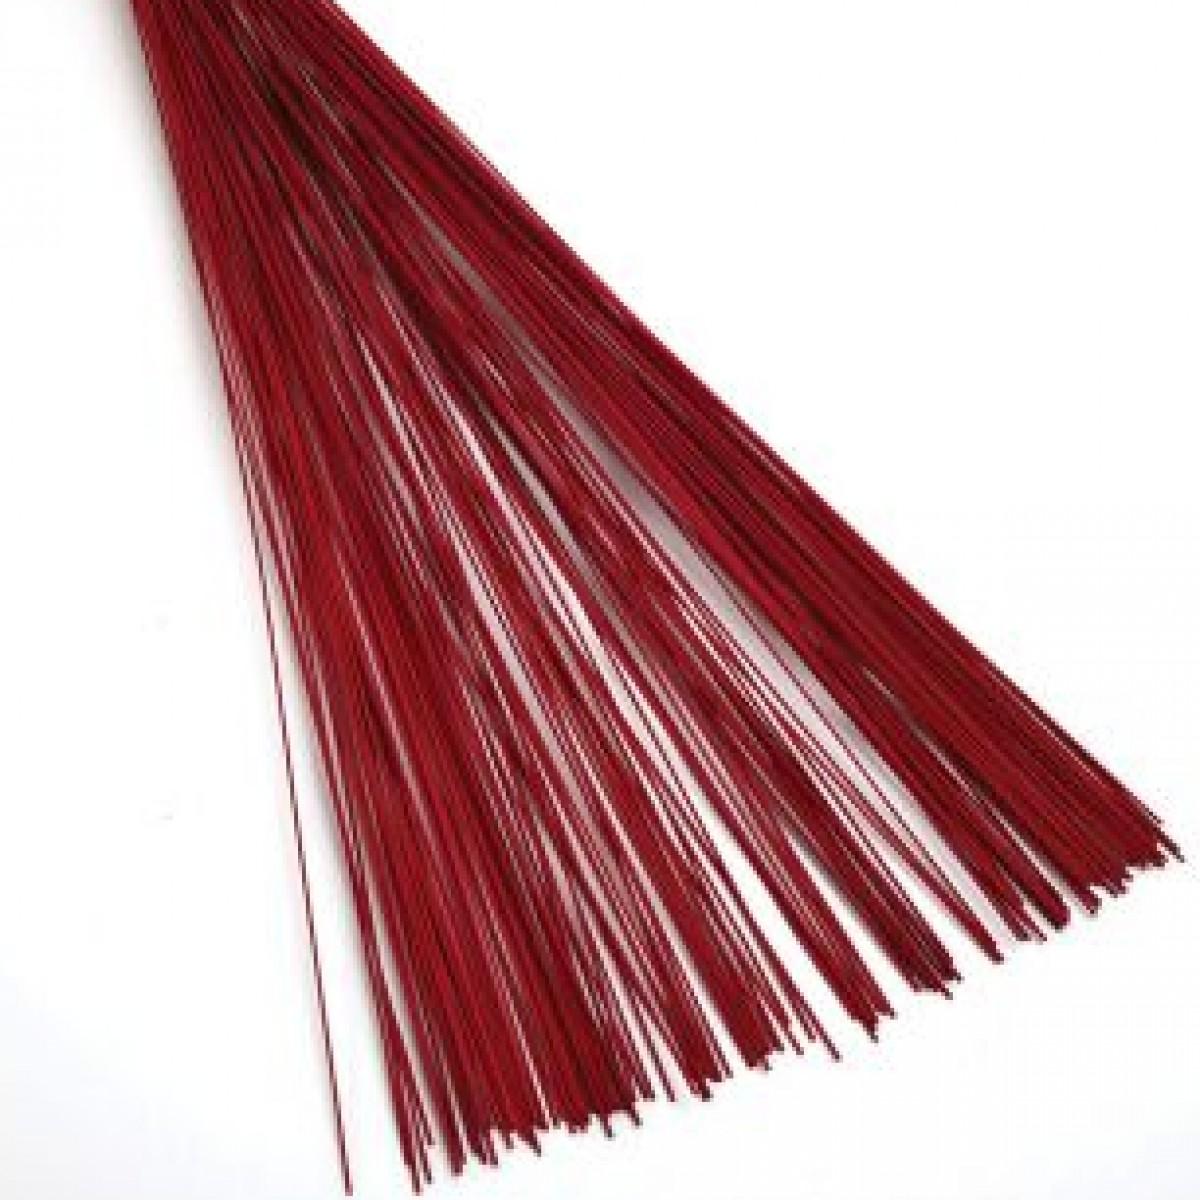 4457 Midelino Stick Red (120-150 Sticks)